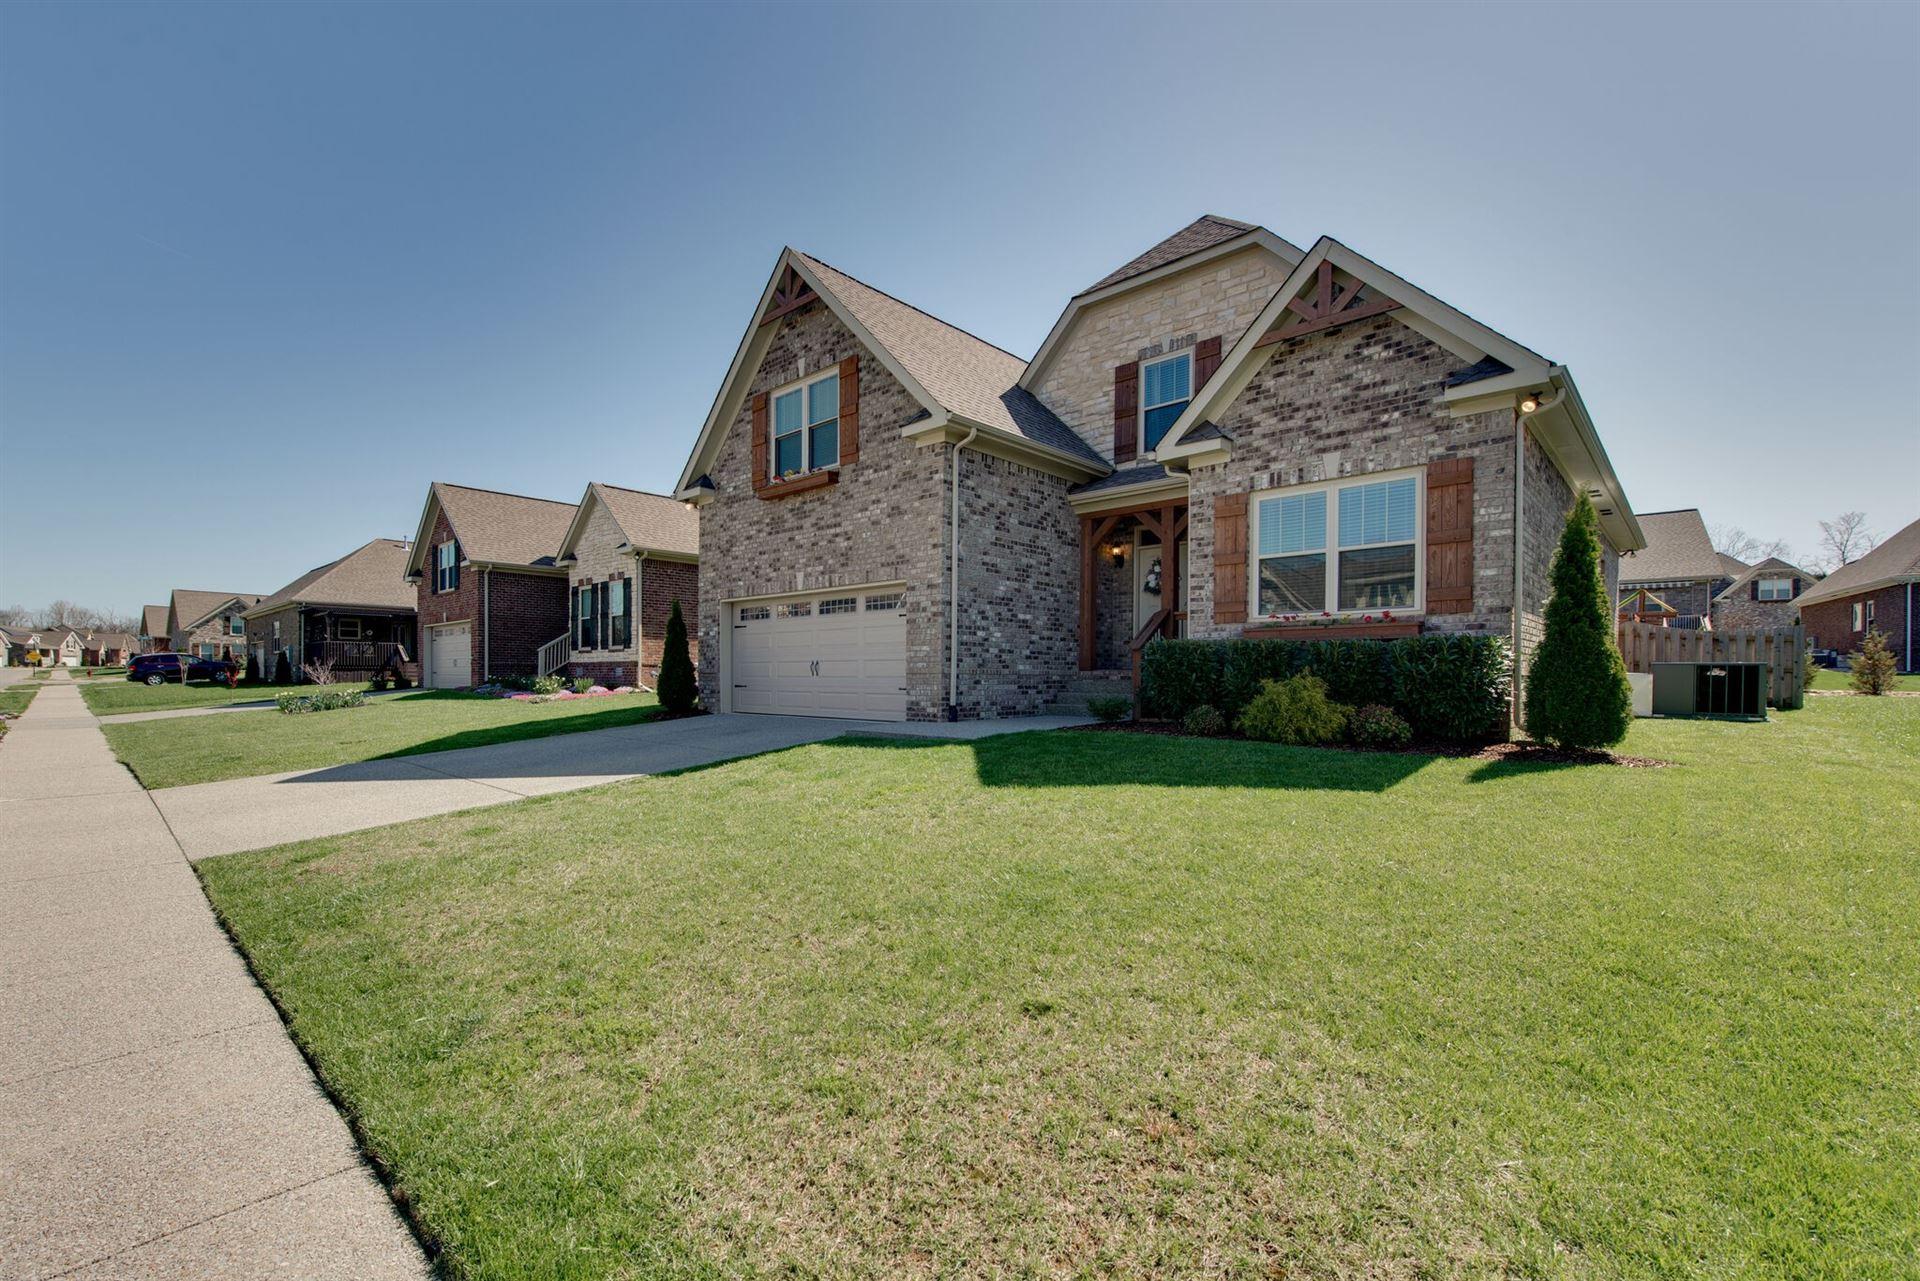 Photo of 9022 Wheeler Drive, Spring Hill, TN 37174 (MLS # 2242776)